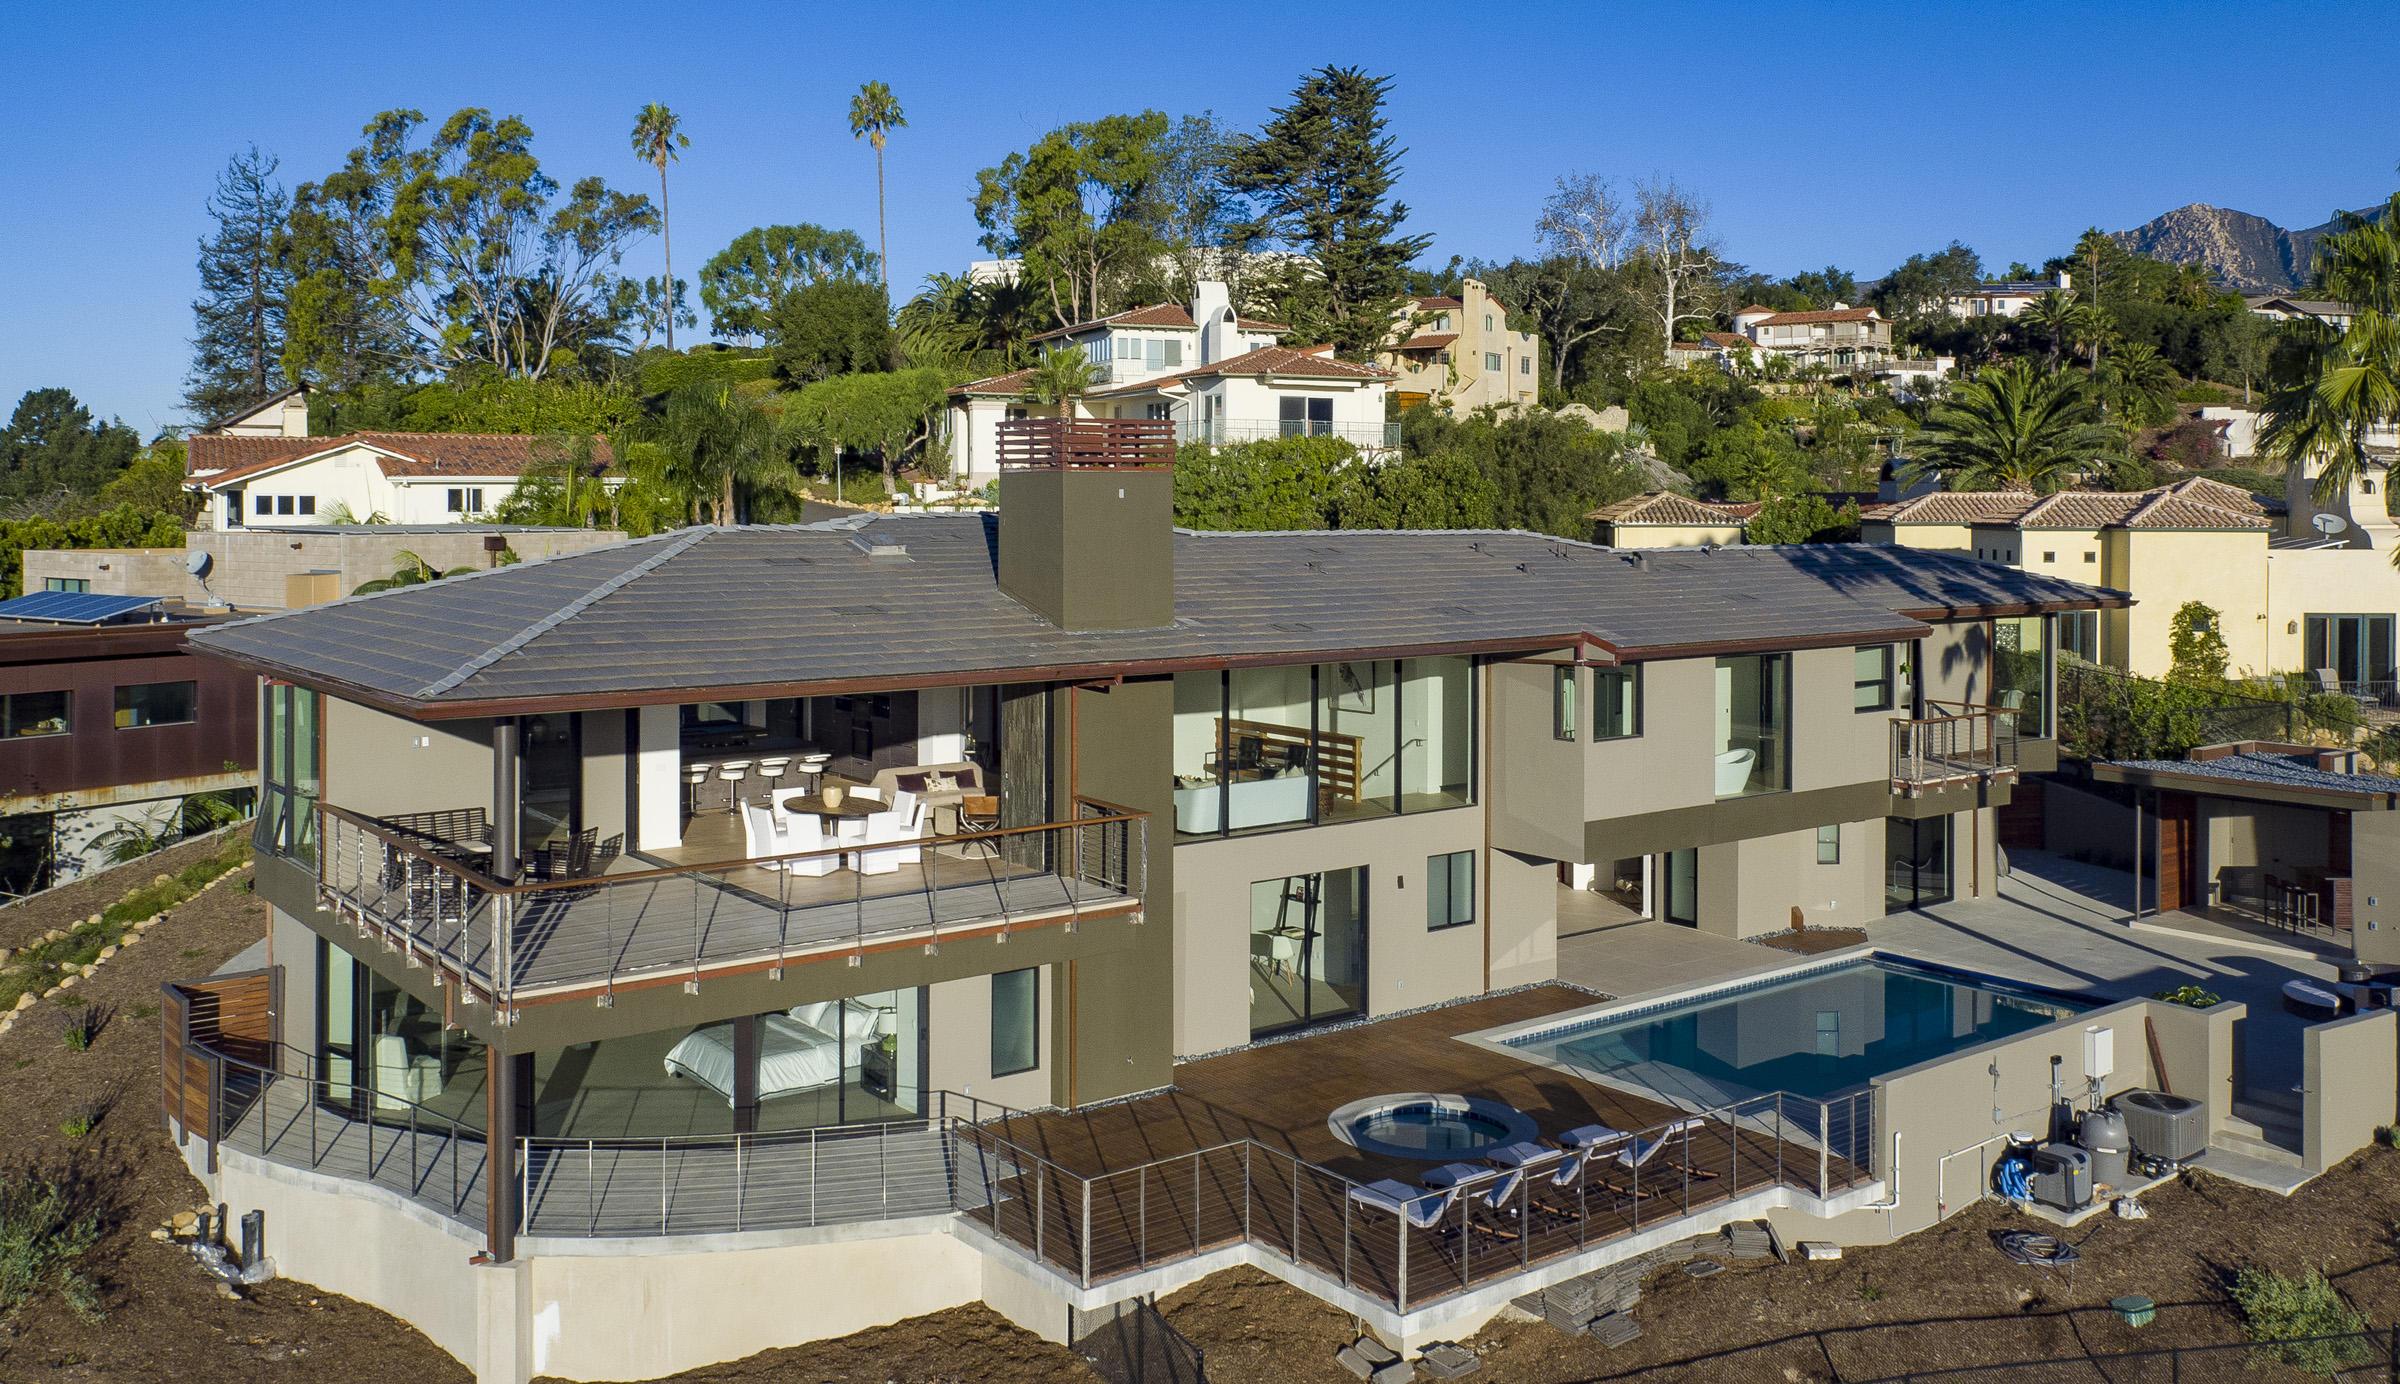 Property photo for 20 Camino Verde Santa Barbara, California 93103 - 16-3572